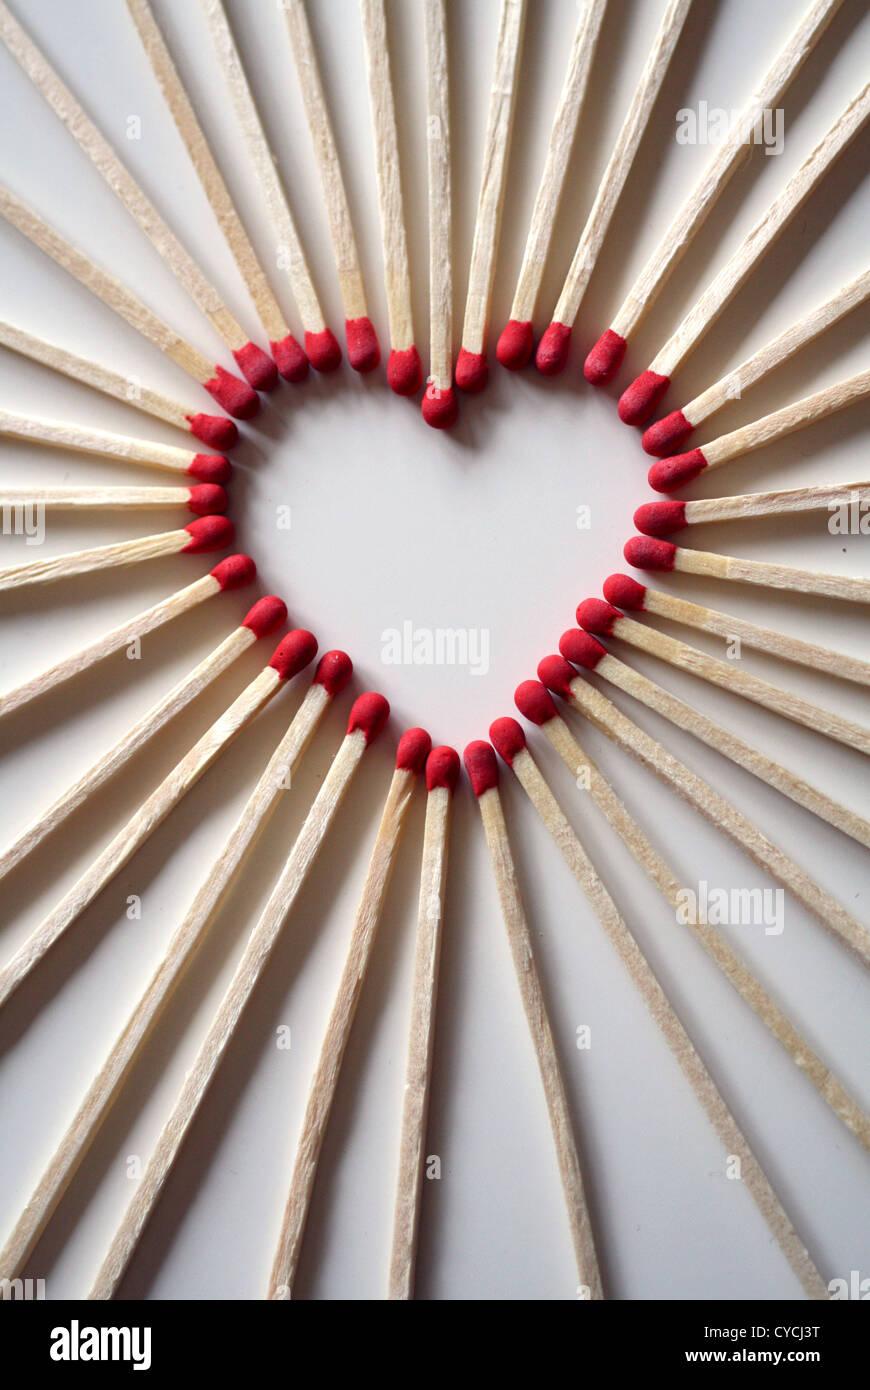 Herzen, herzförmig, Streichholz Stockbild